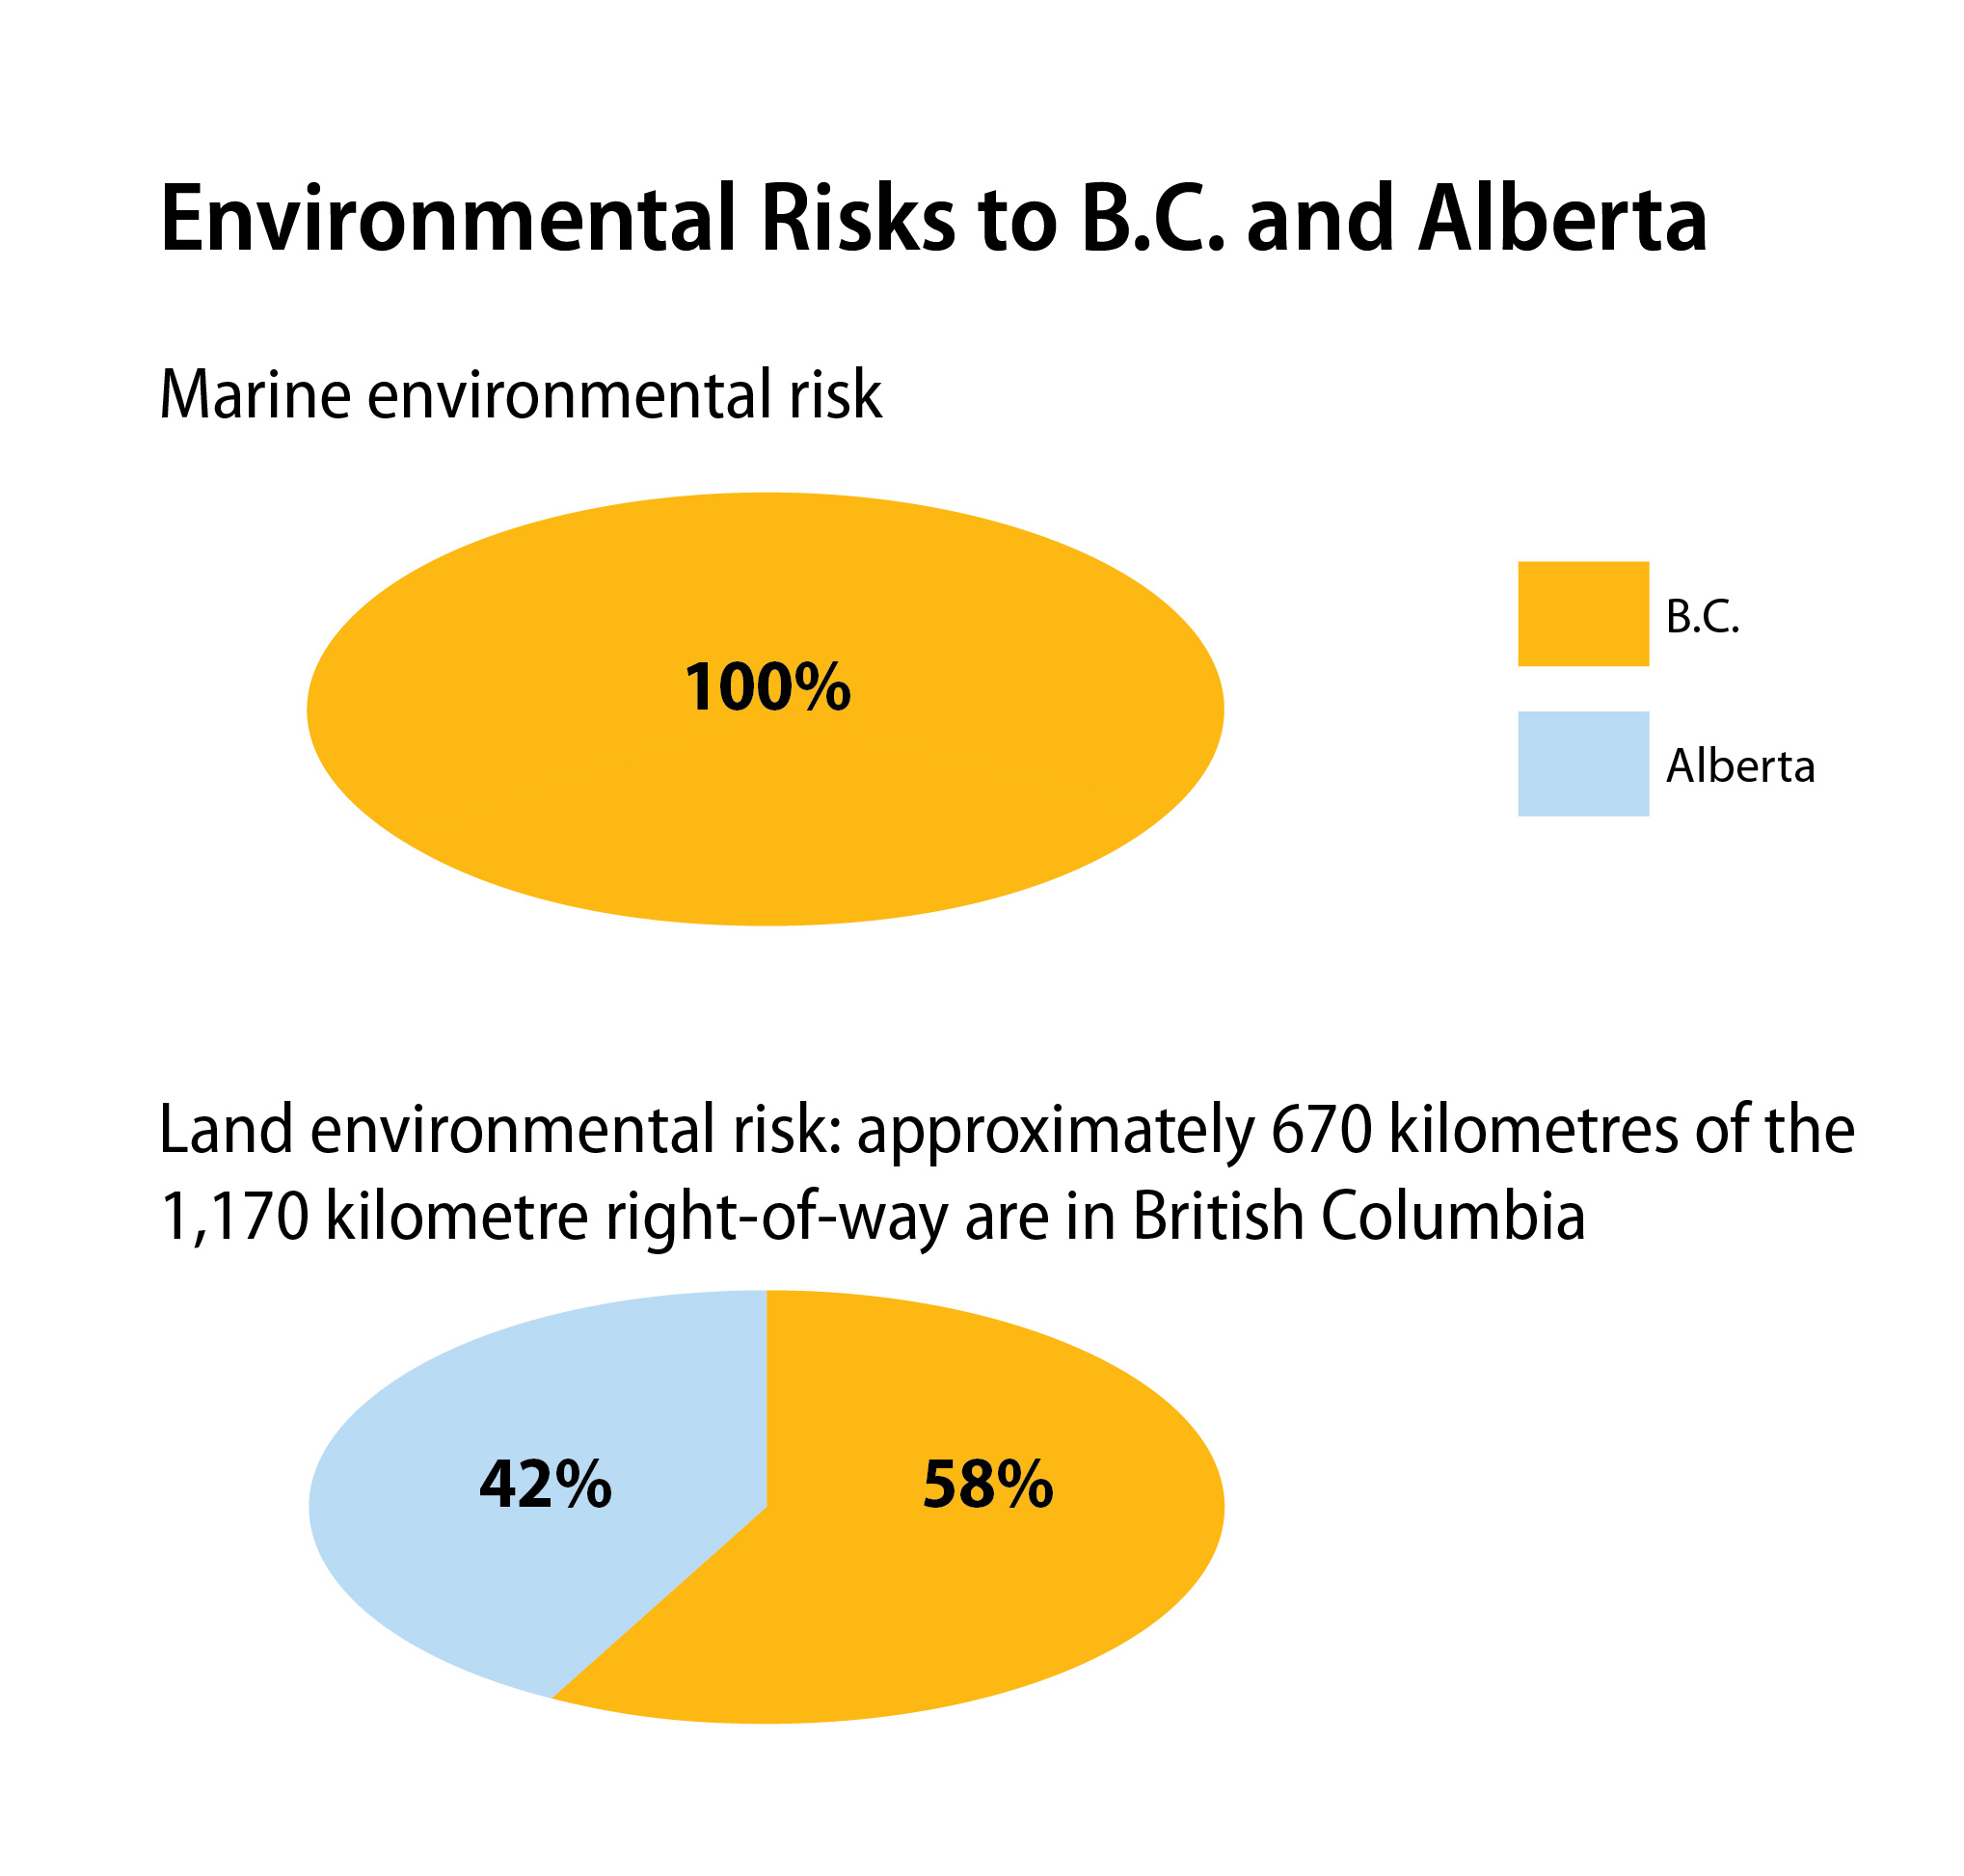 Environmental Risks Chart